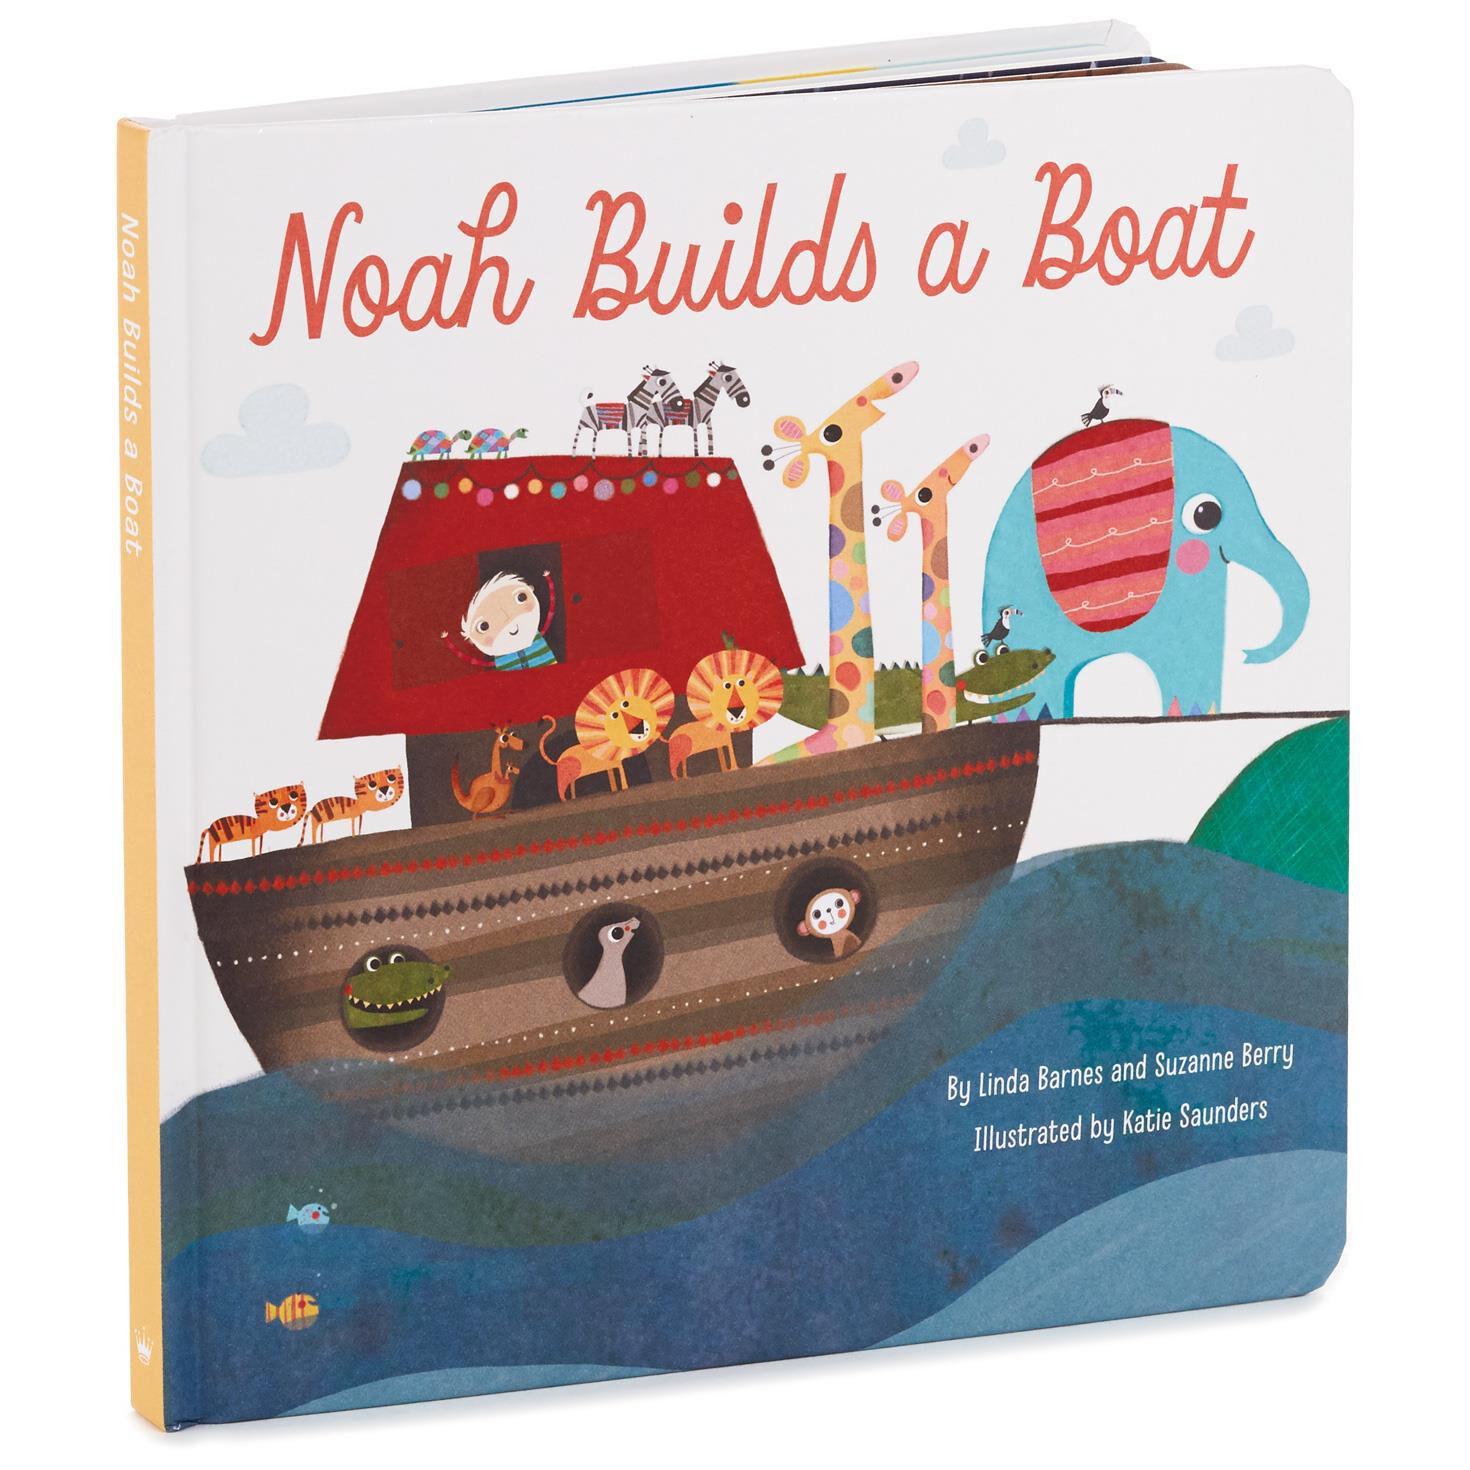 noah builds a boat board book kids books hallmark